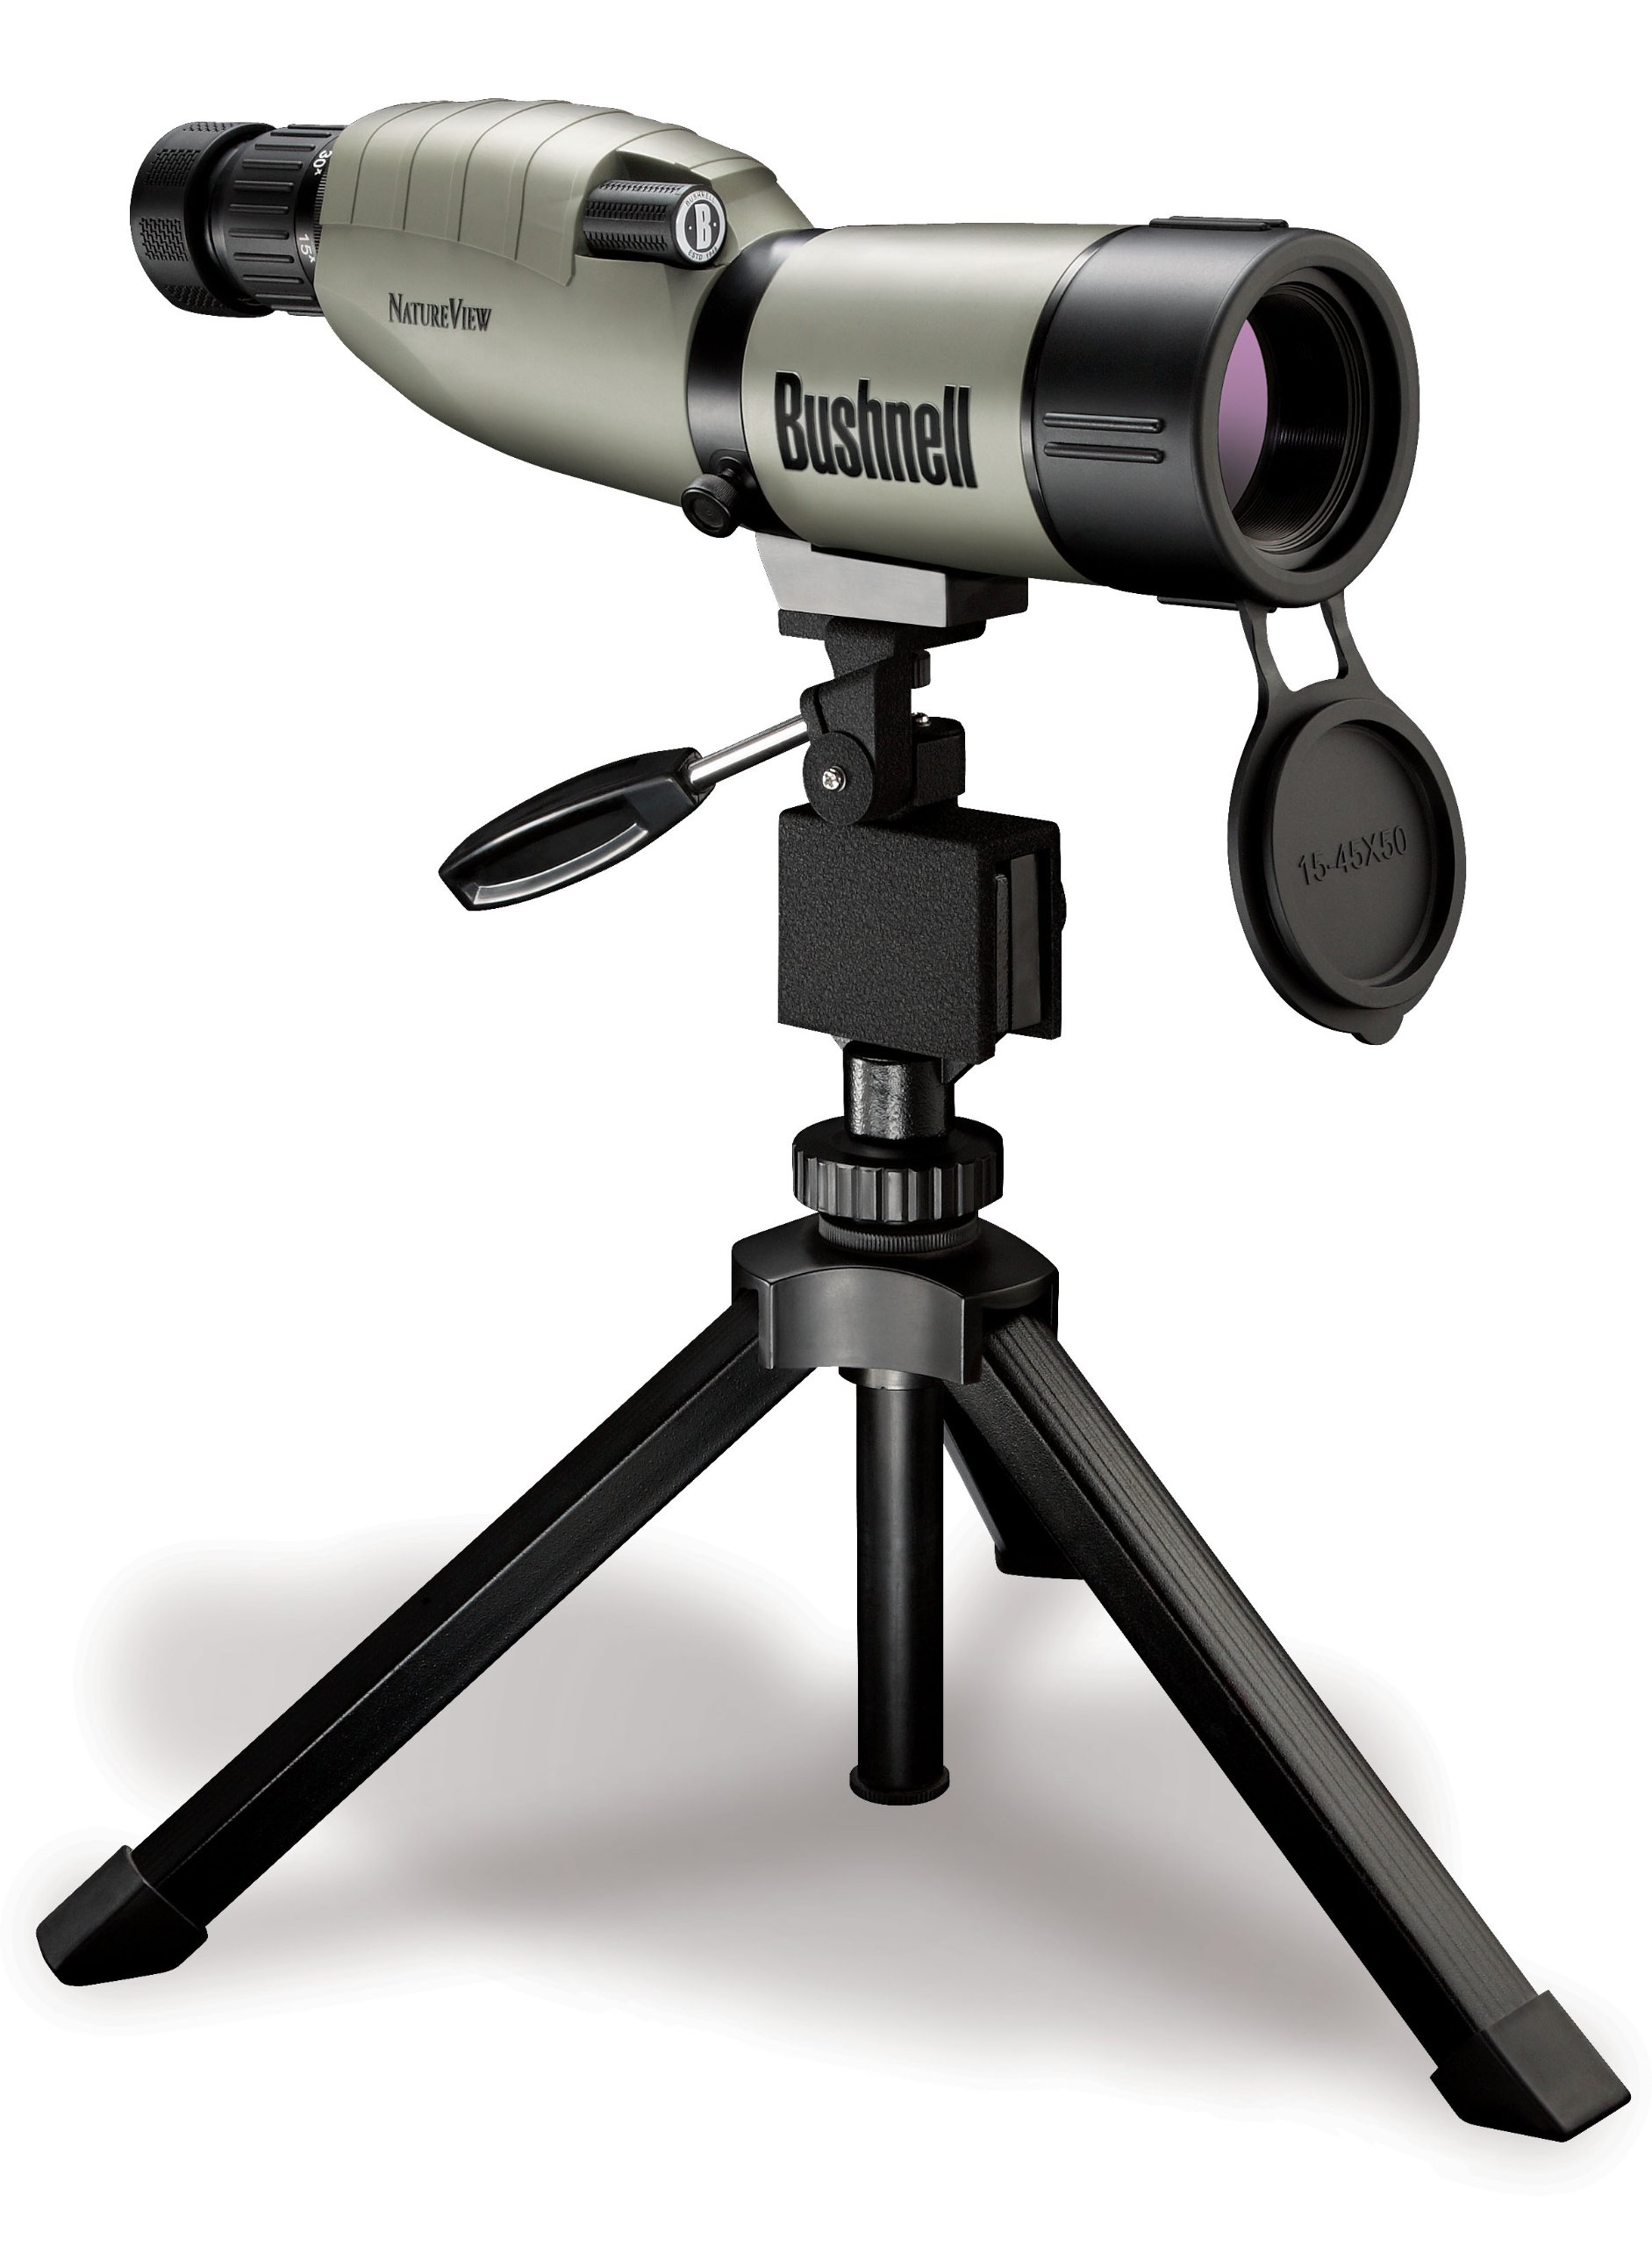 Bushnell Trophy XLT 15-45 x 50mm Porro Prism Waterproof/Fogproof Spotting Scope with Compact Tripod, Tan